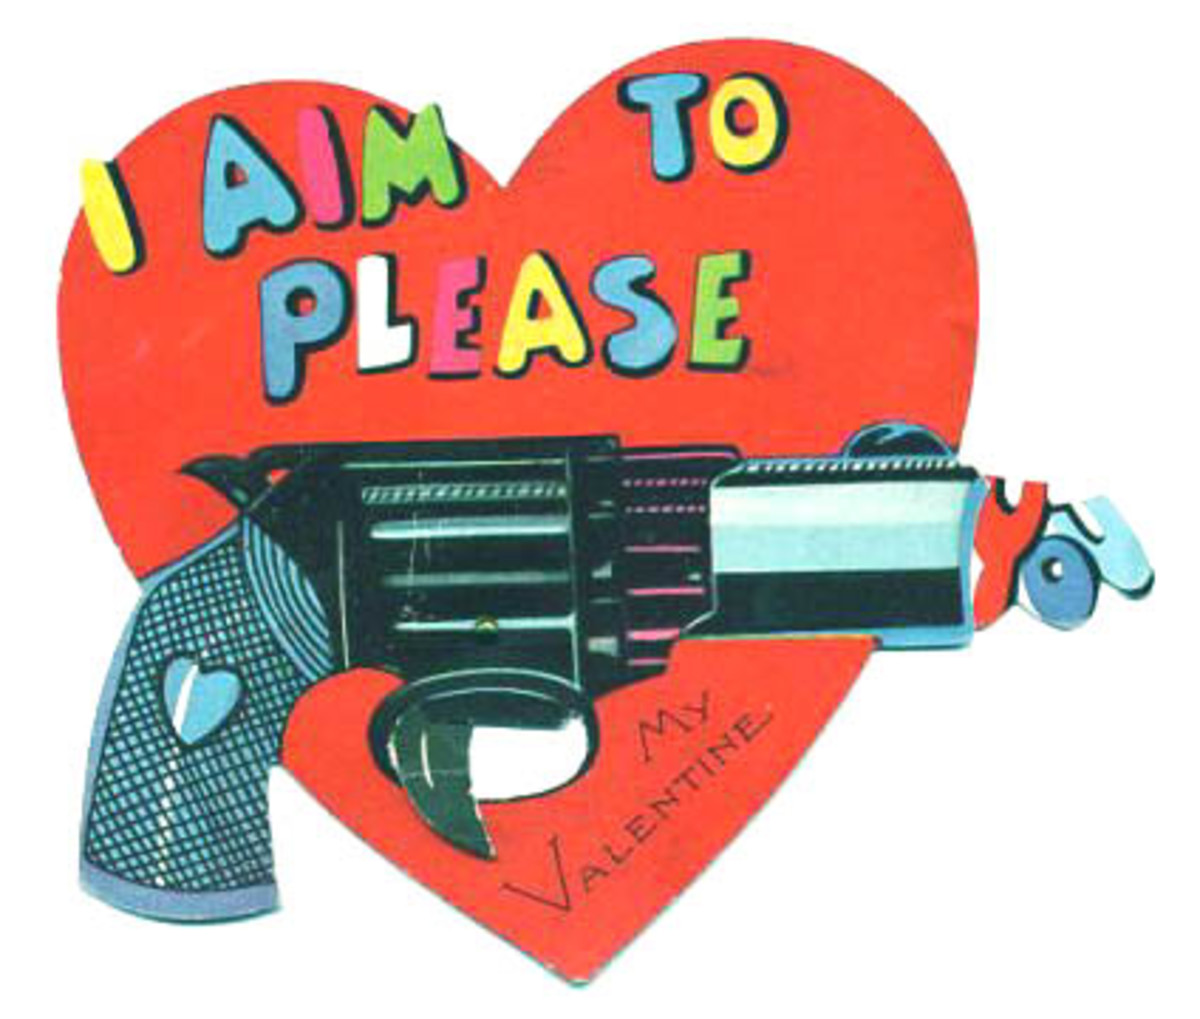 suggestive-vintage-valentines